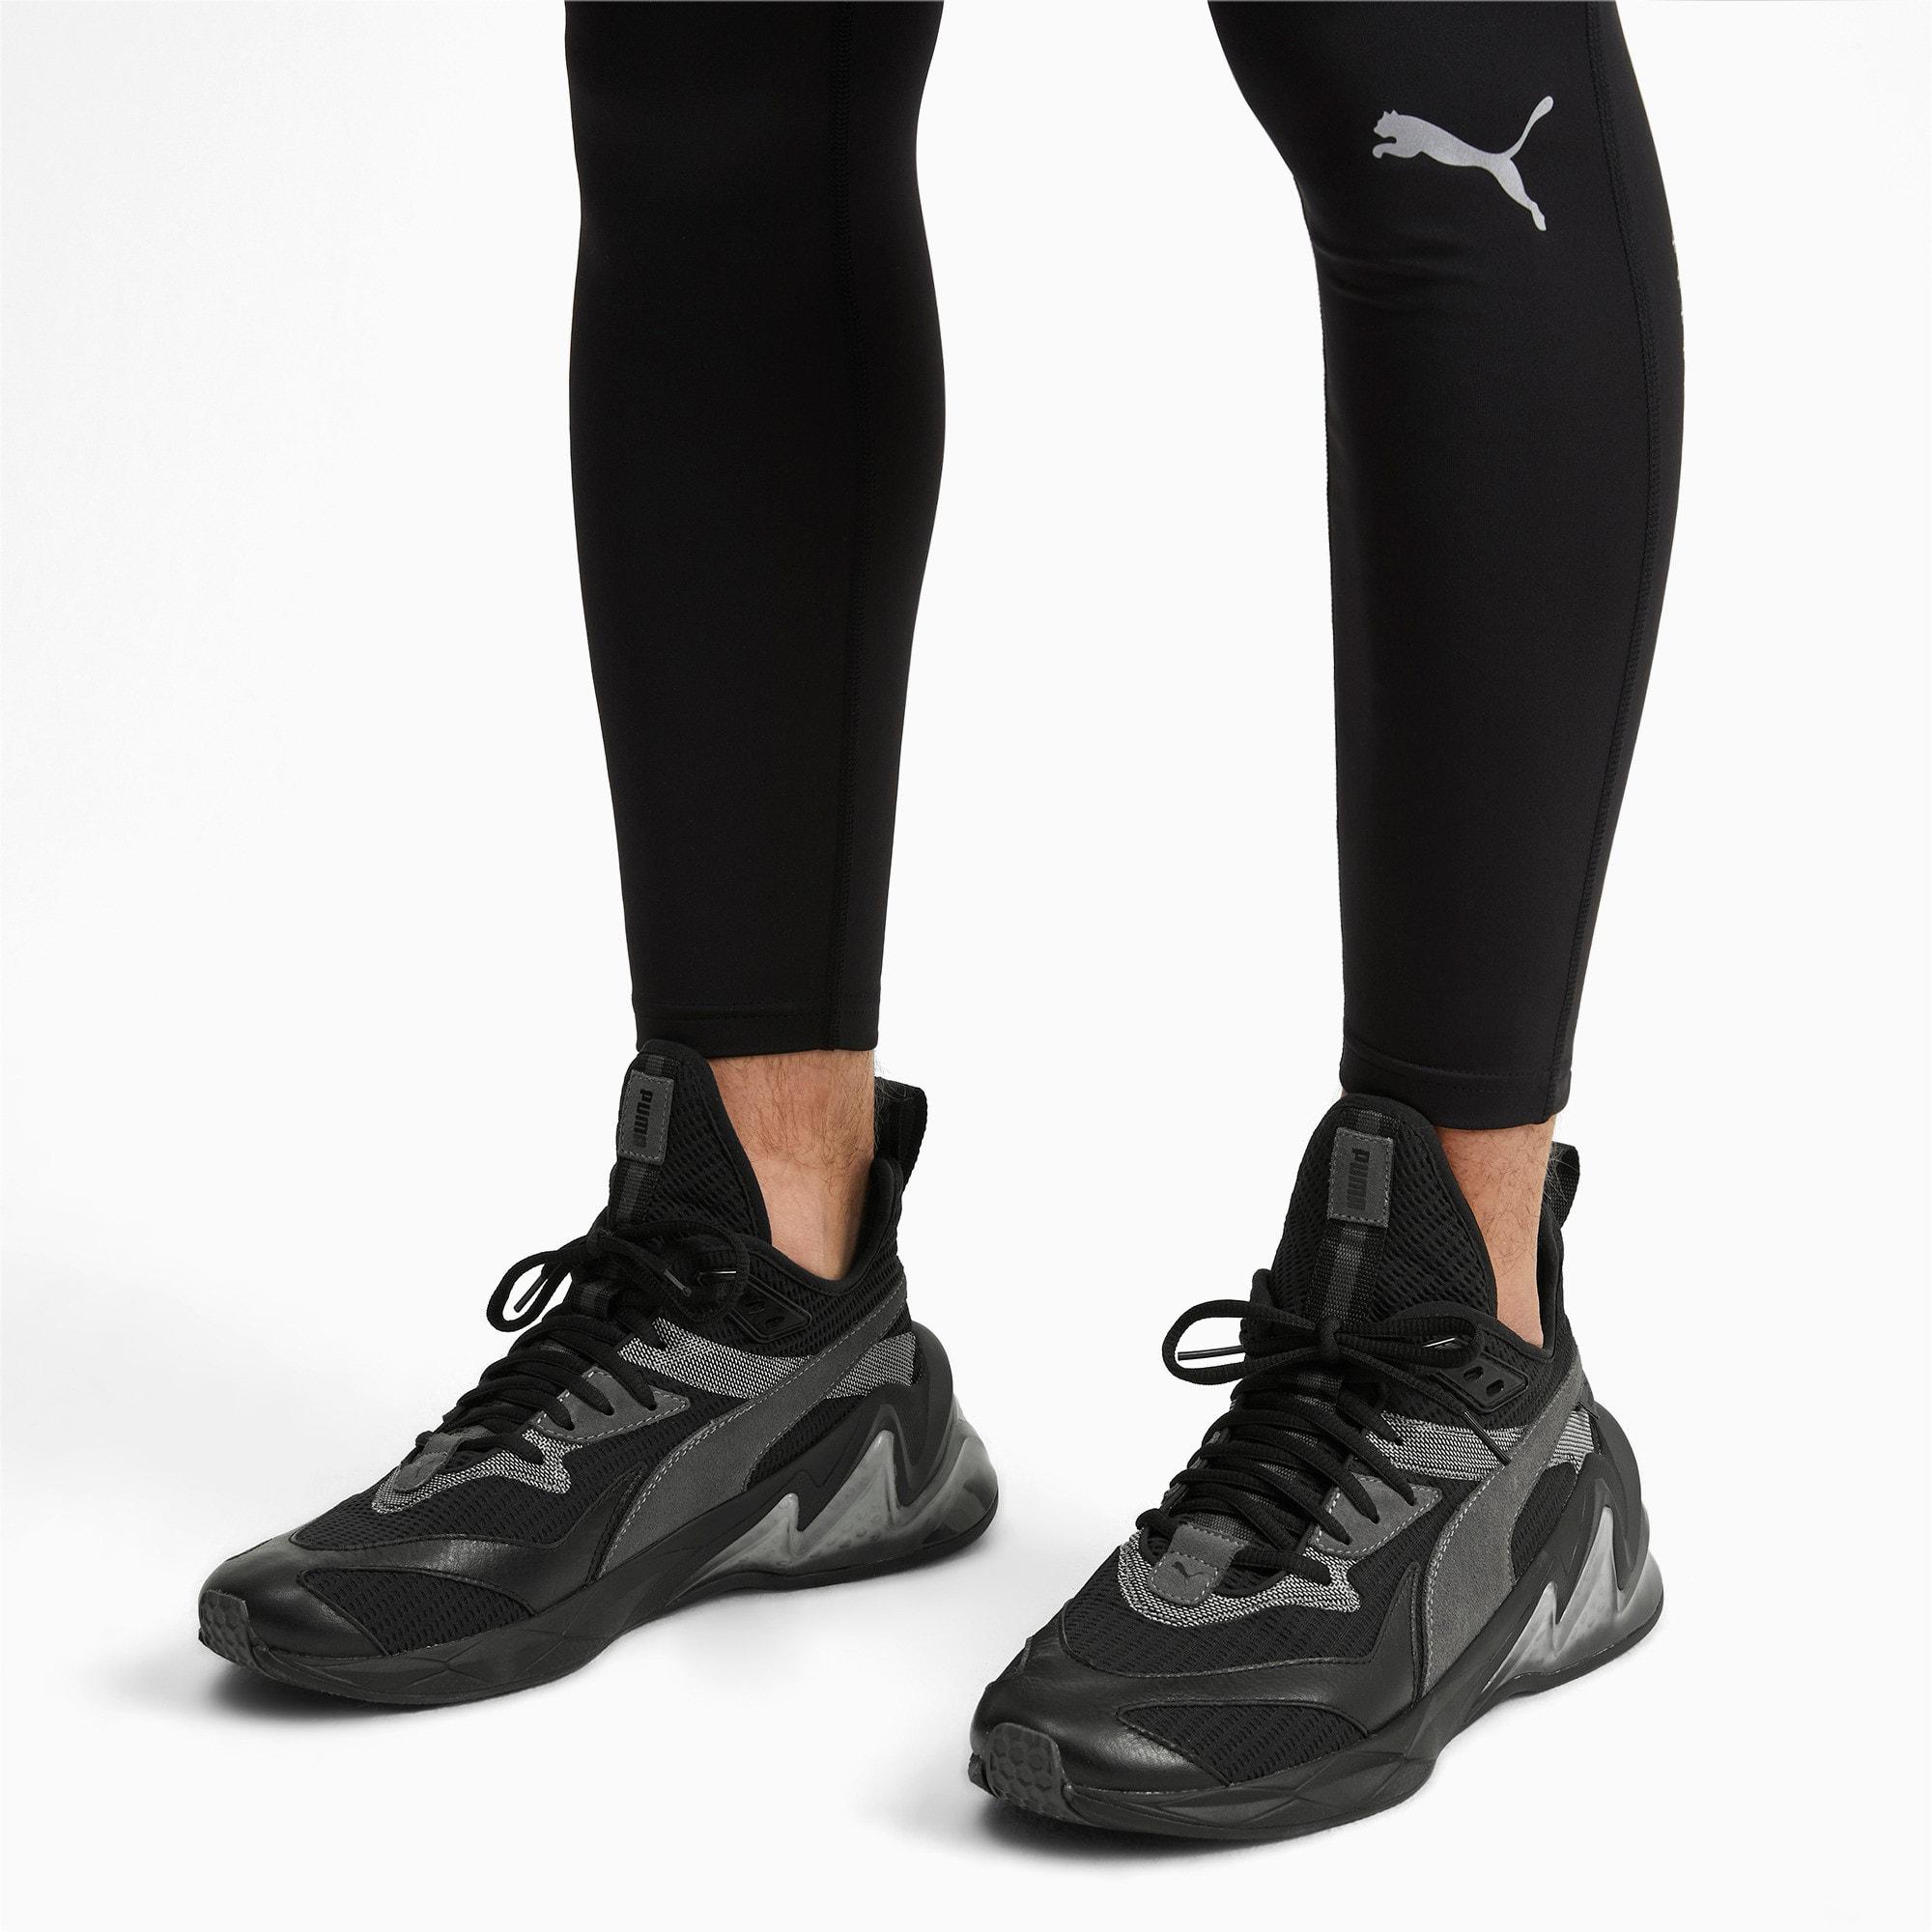 Thumbnail 2 of LQDCELL Origin Men's Training Shoes, Puma Black-Asphalt, medium